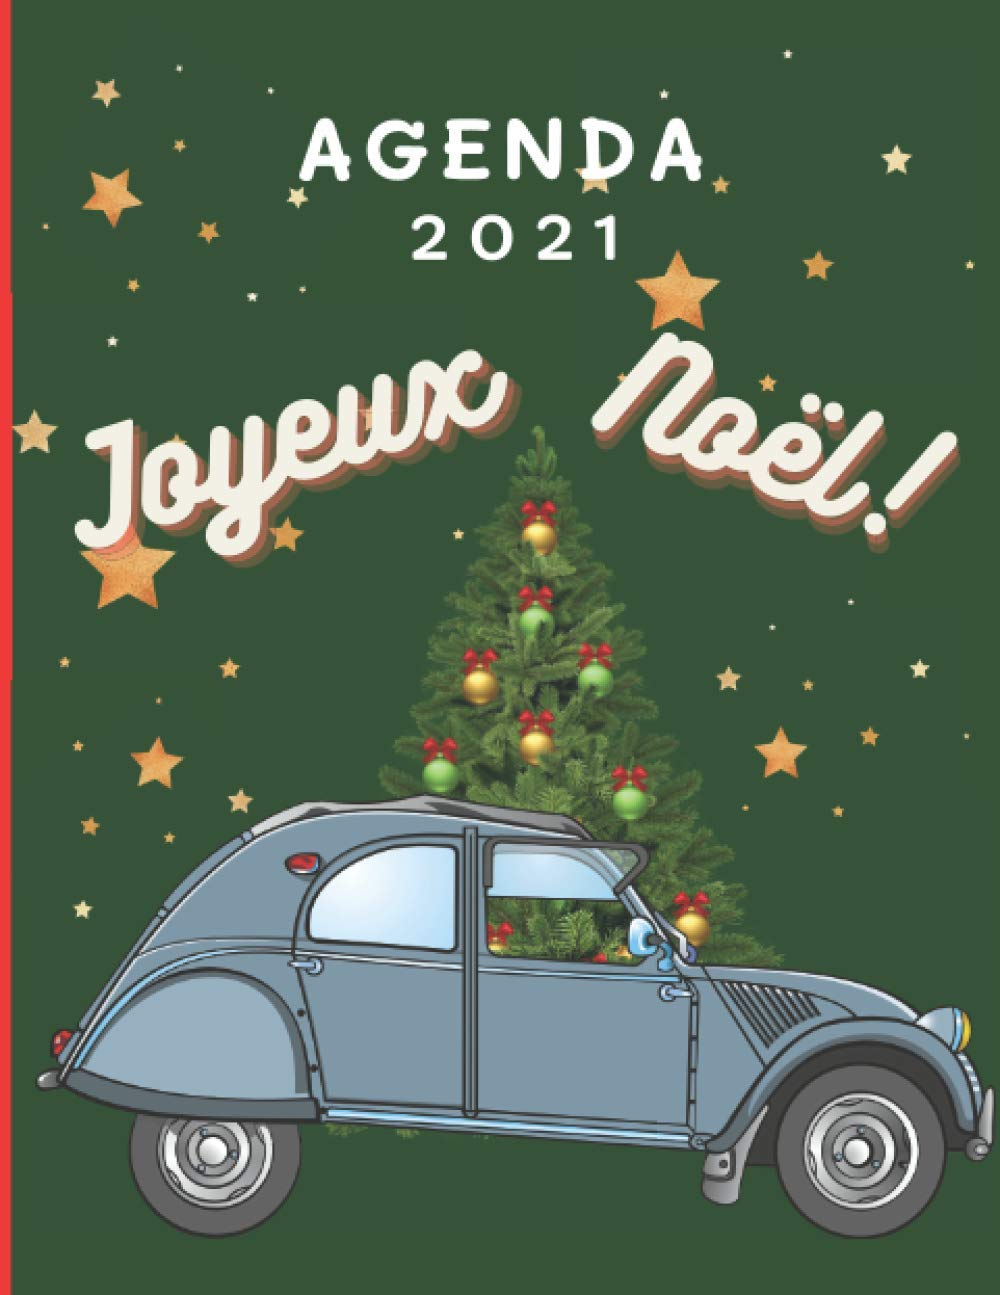 Noel Automobile Agenda 2021 : 2cv joyeux noël: Agenda 2021 joyeux noël automobile